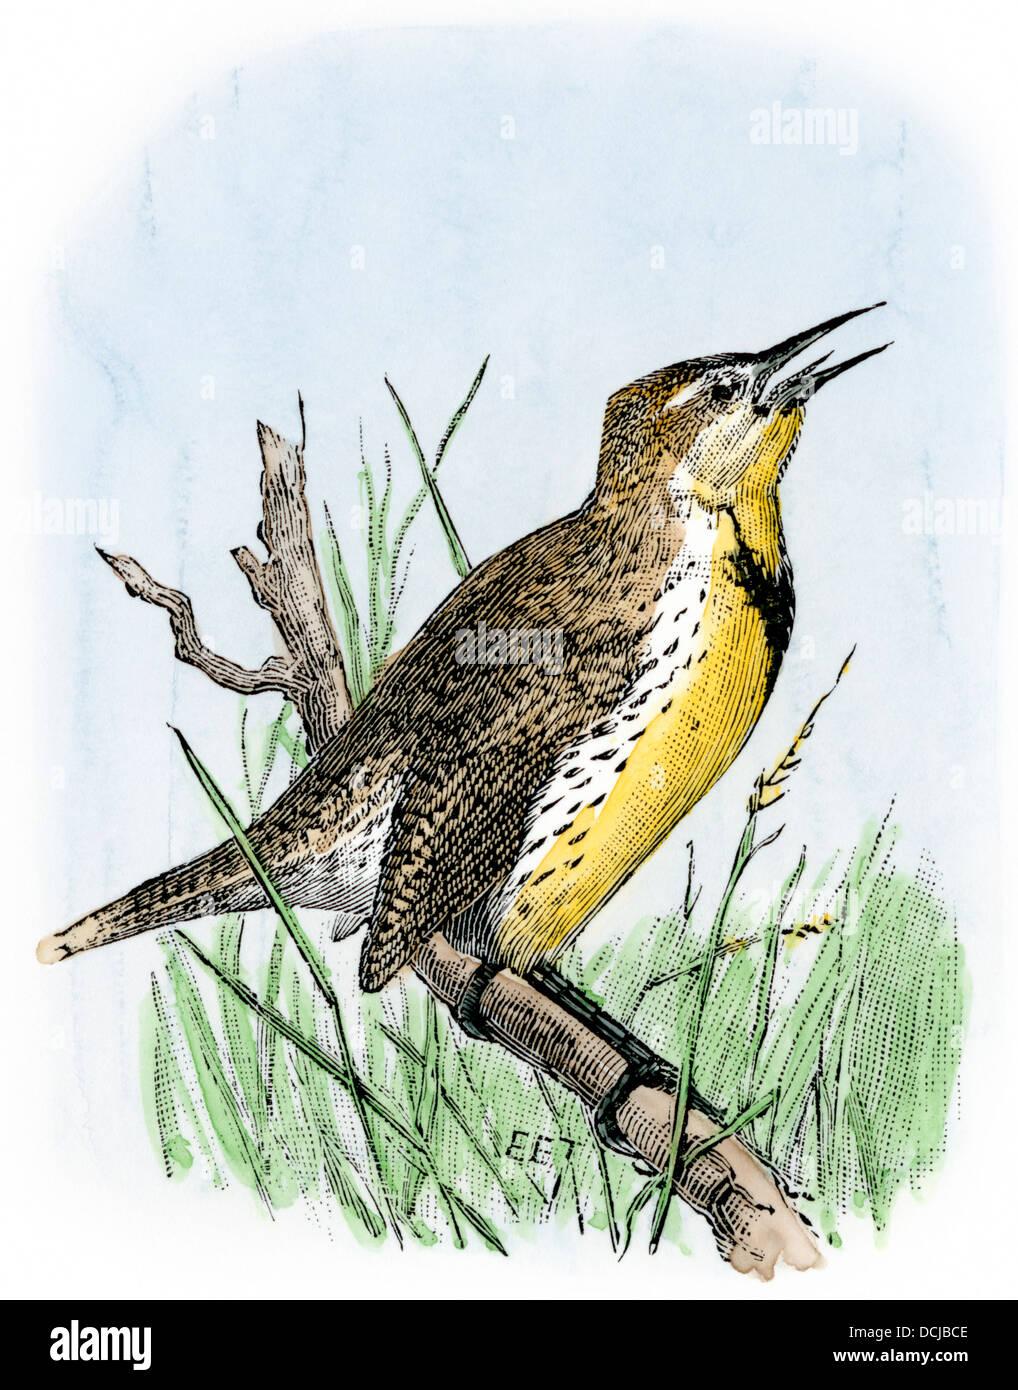 Western meadowlark singing. Stock Photo